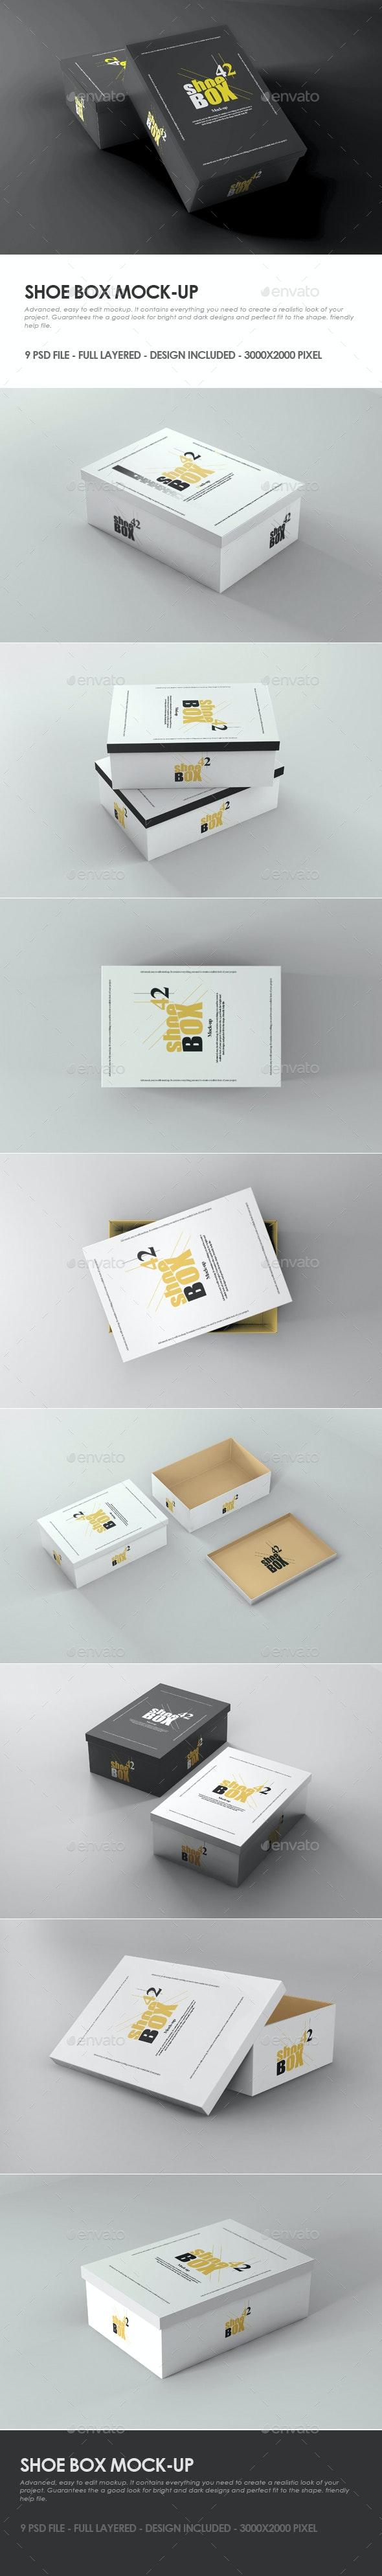 Shoe Box Mock-up - Packaging Product Mock-Ups